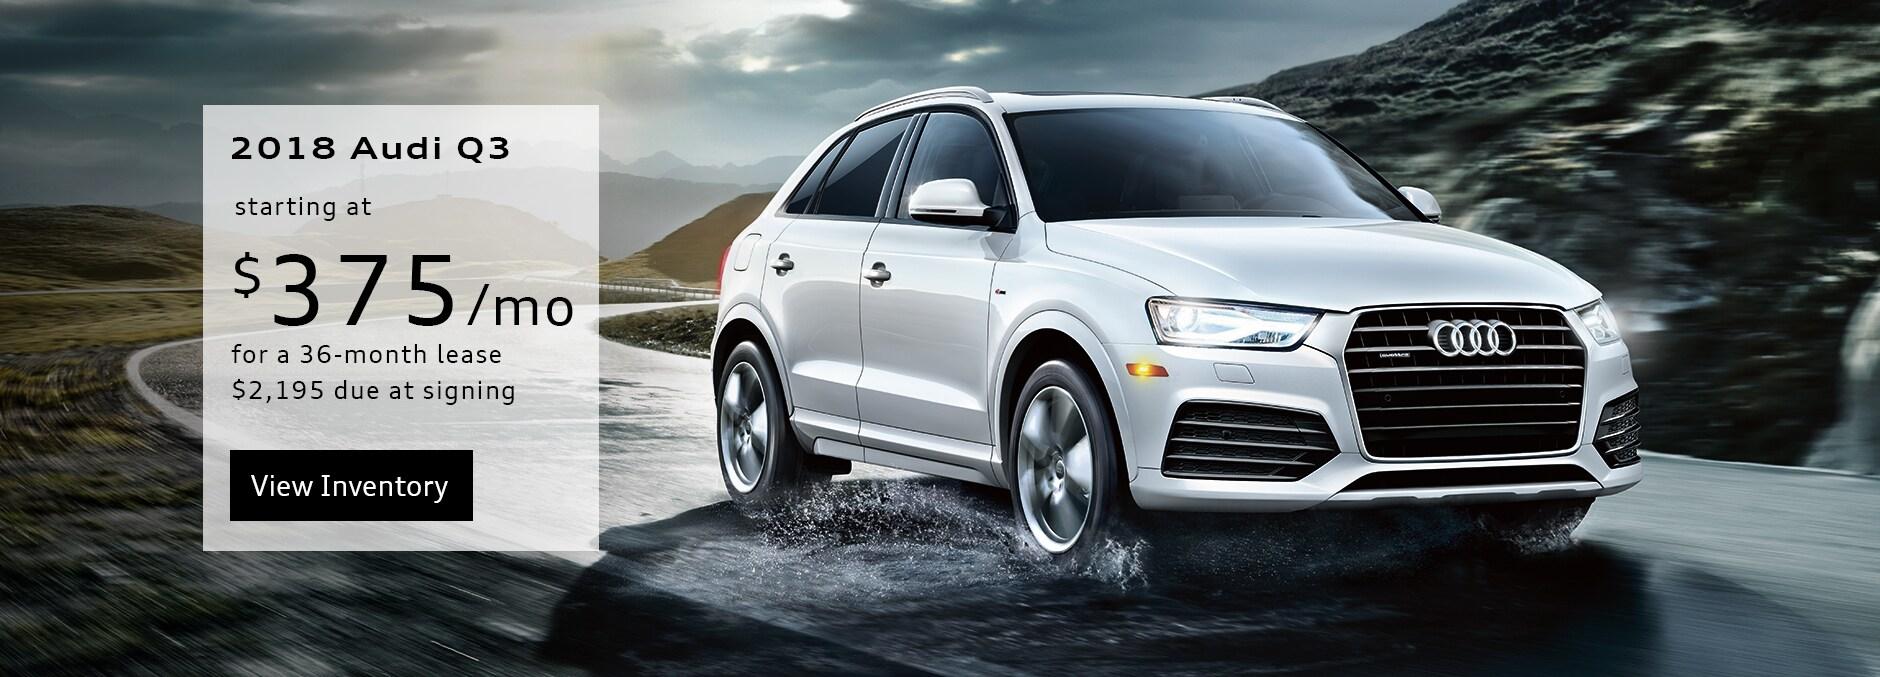 htm come audi atlanta black offers friday ga deals car special savings